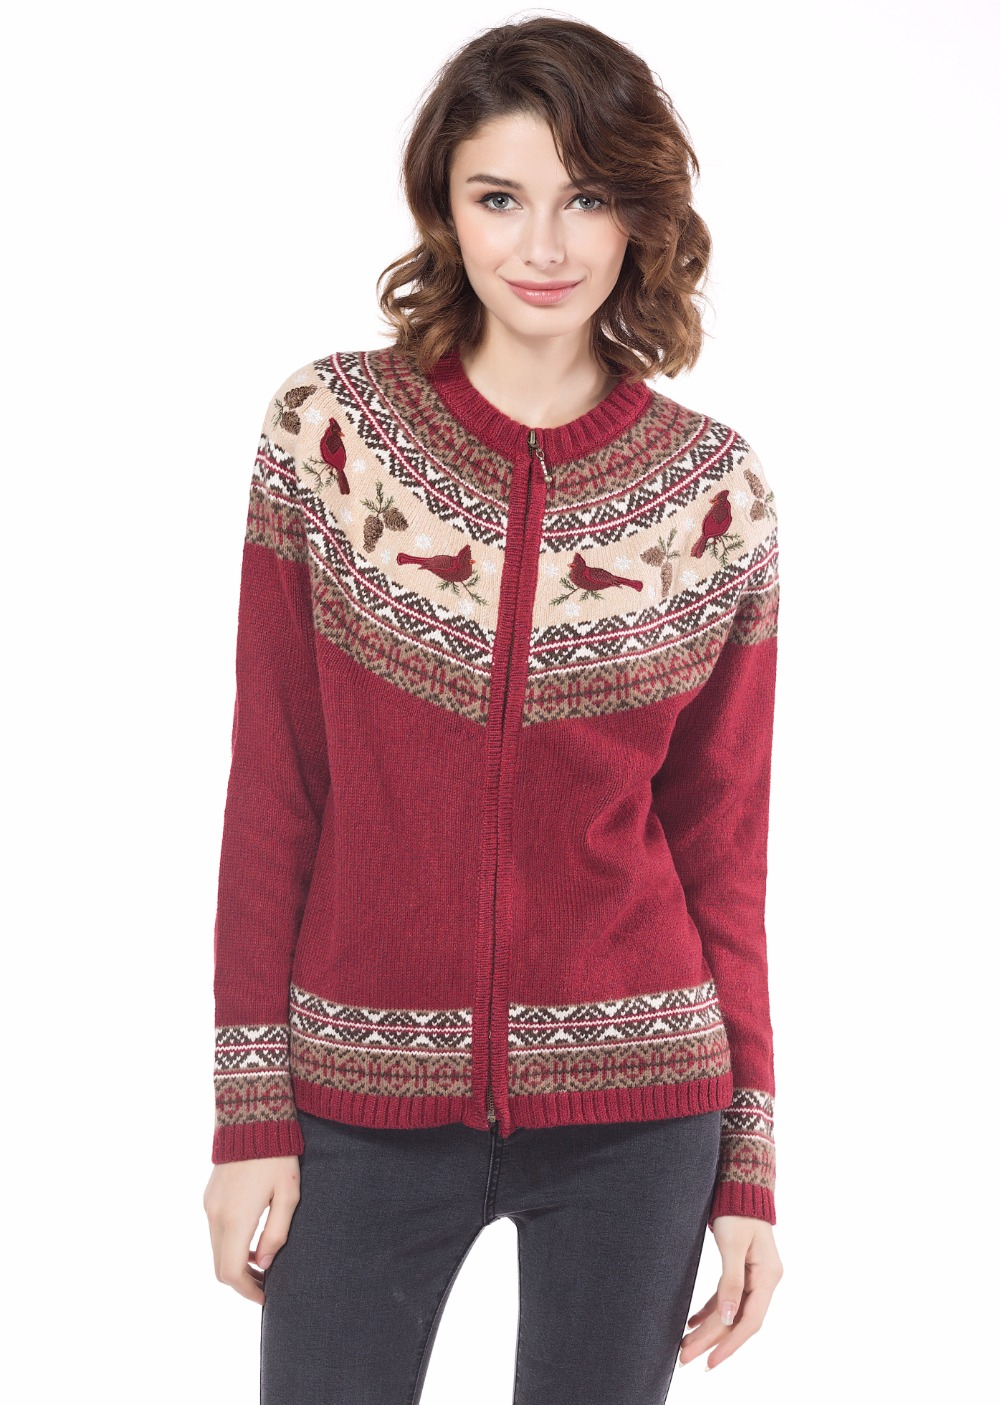 Poncho Sweater Women S